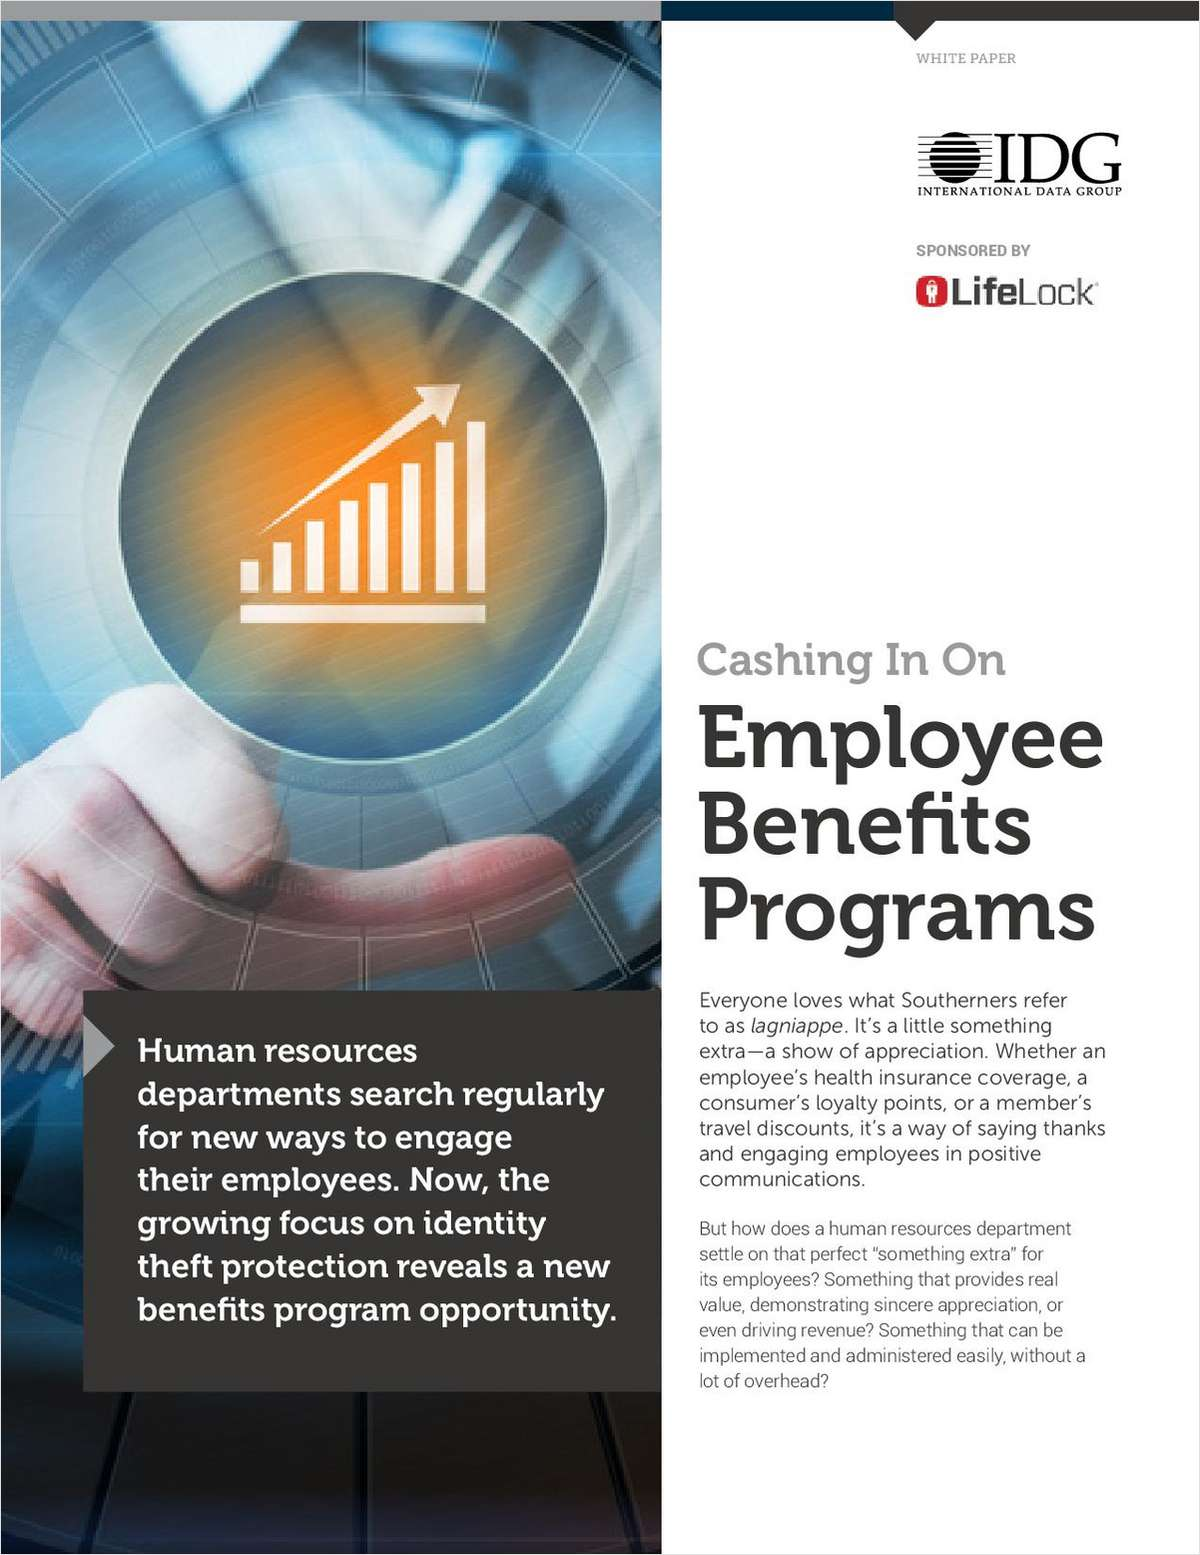 Cashing in on Employee Benefit Programs